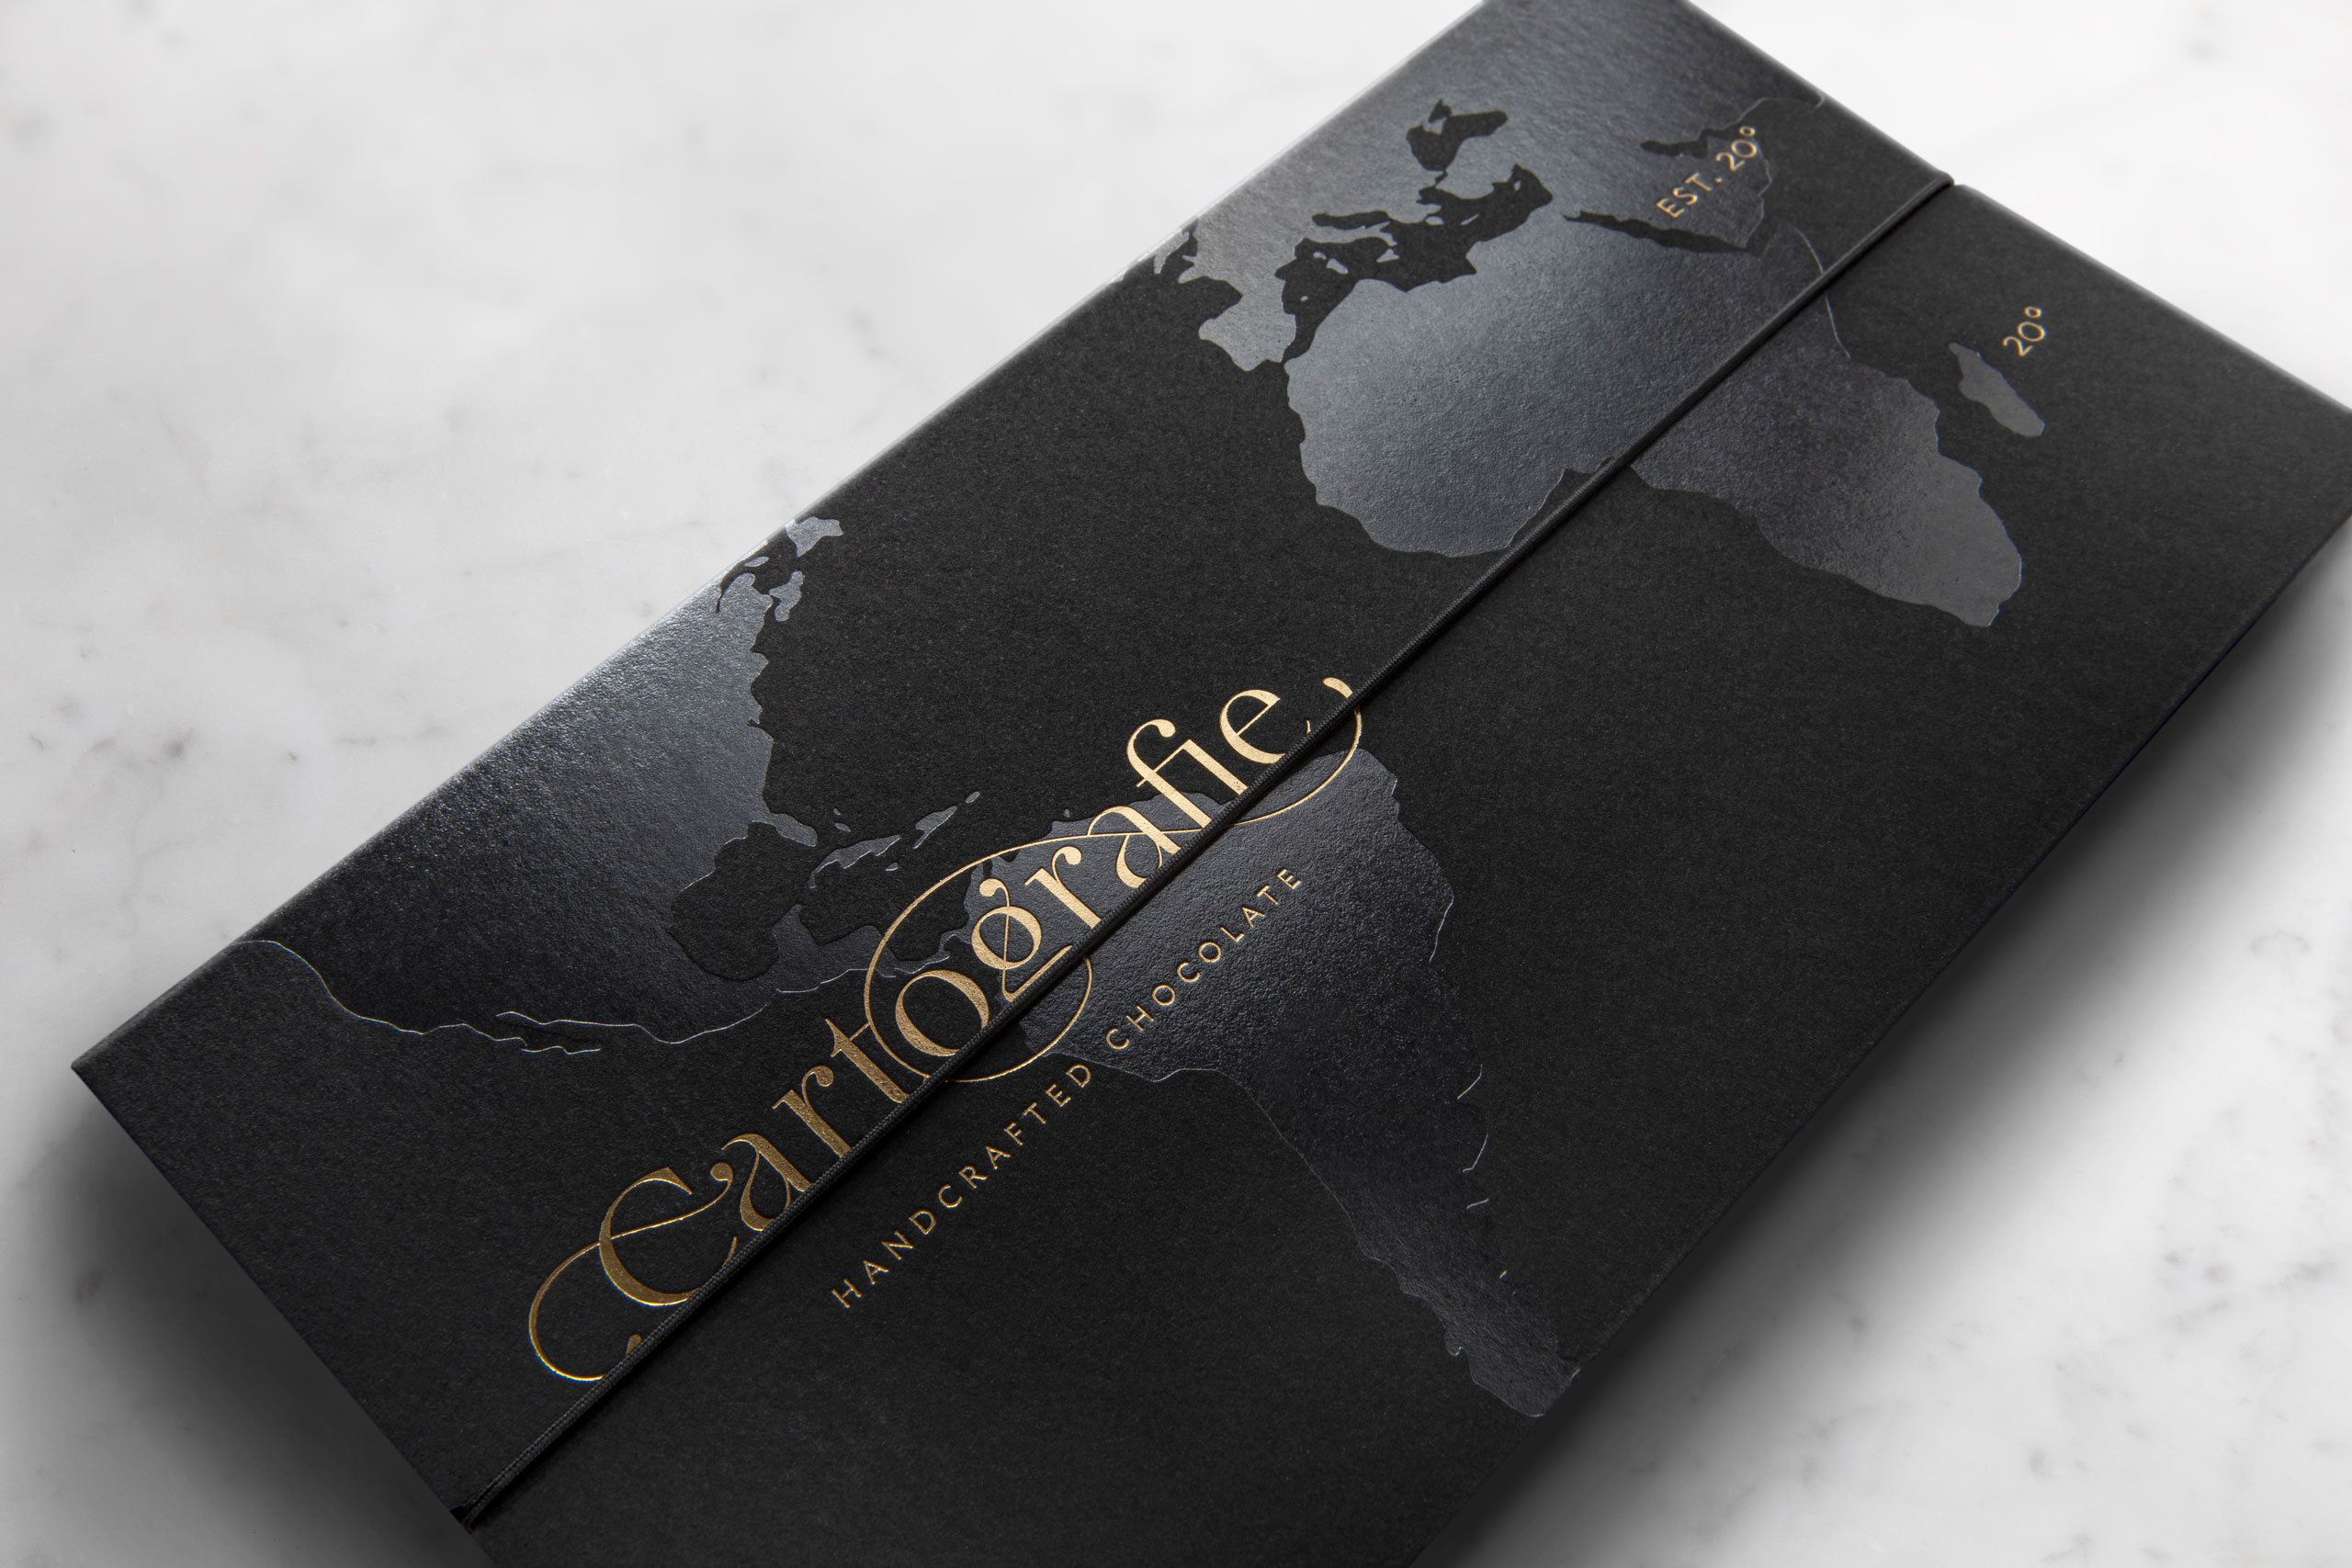 Cartografie Chocolates packaging black box